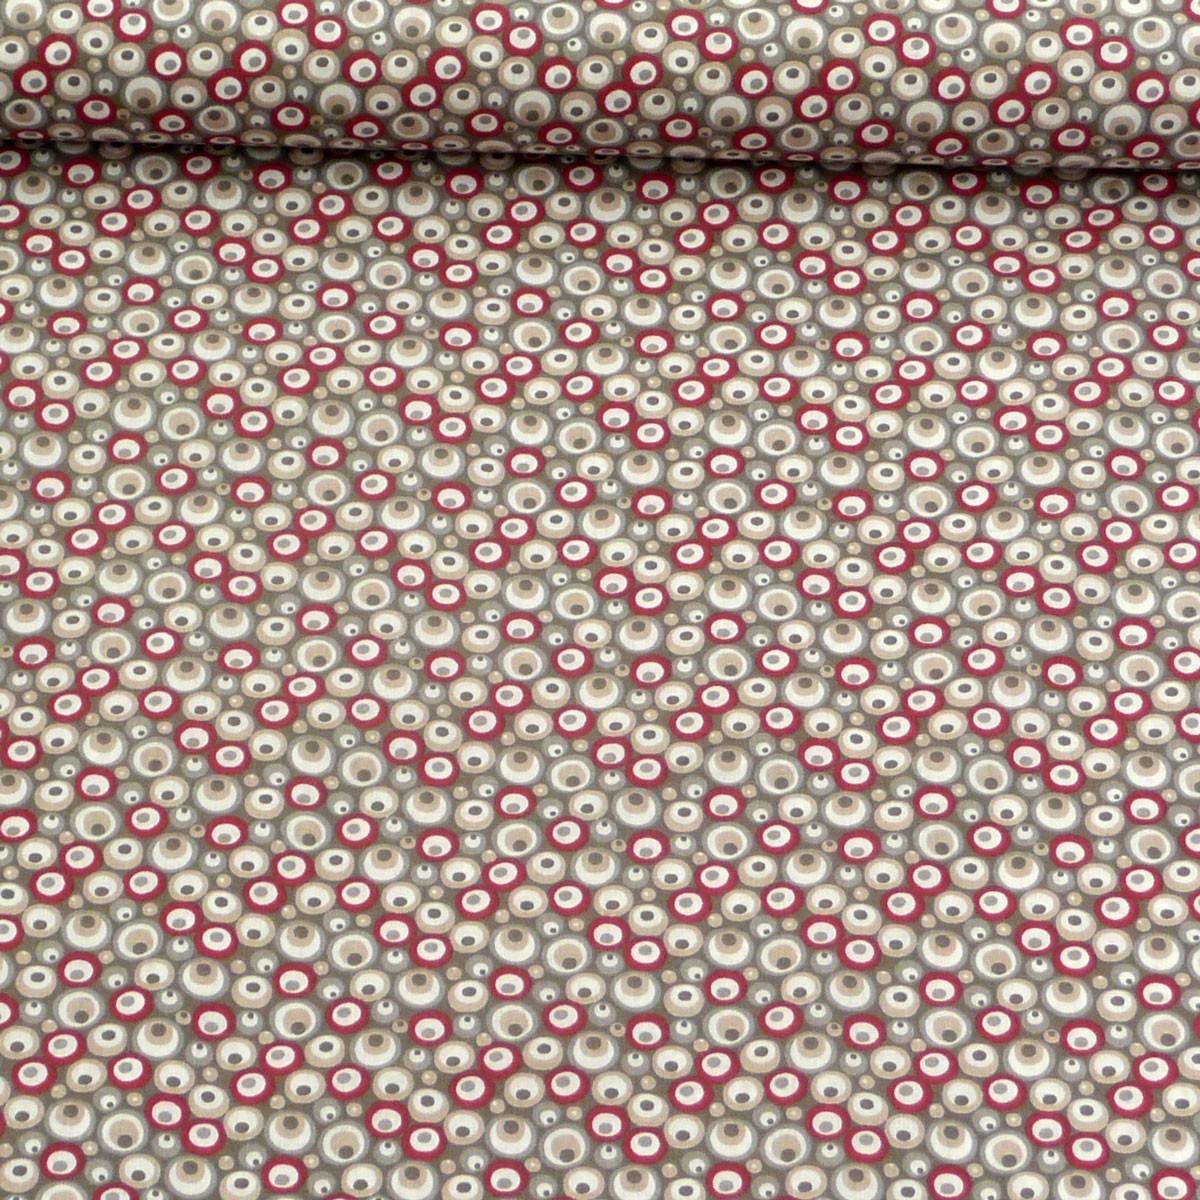 baumwollstoff stoff meterware kreise grau rot beige wei 1 6m breite stoffe stoffe gemustert. Black Bedroom Furniture Sets. Home Design Ideas